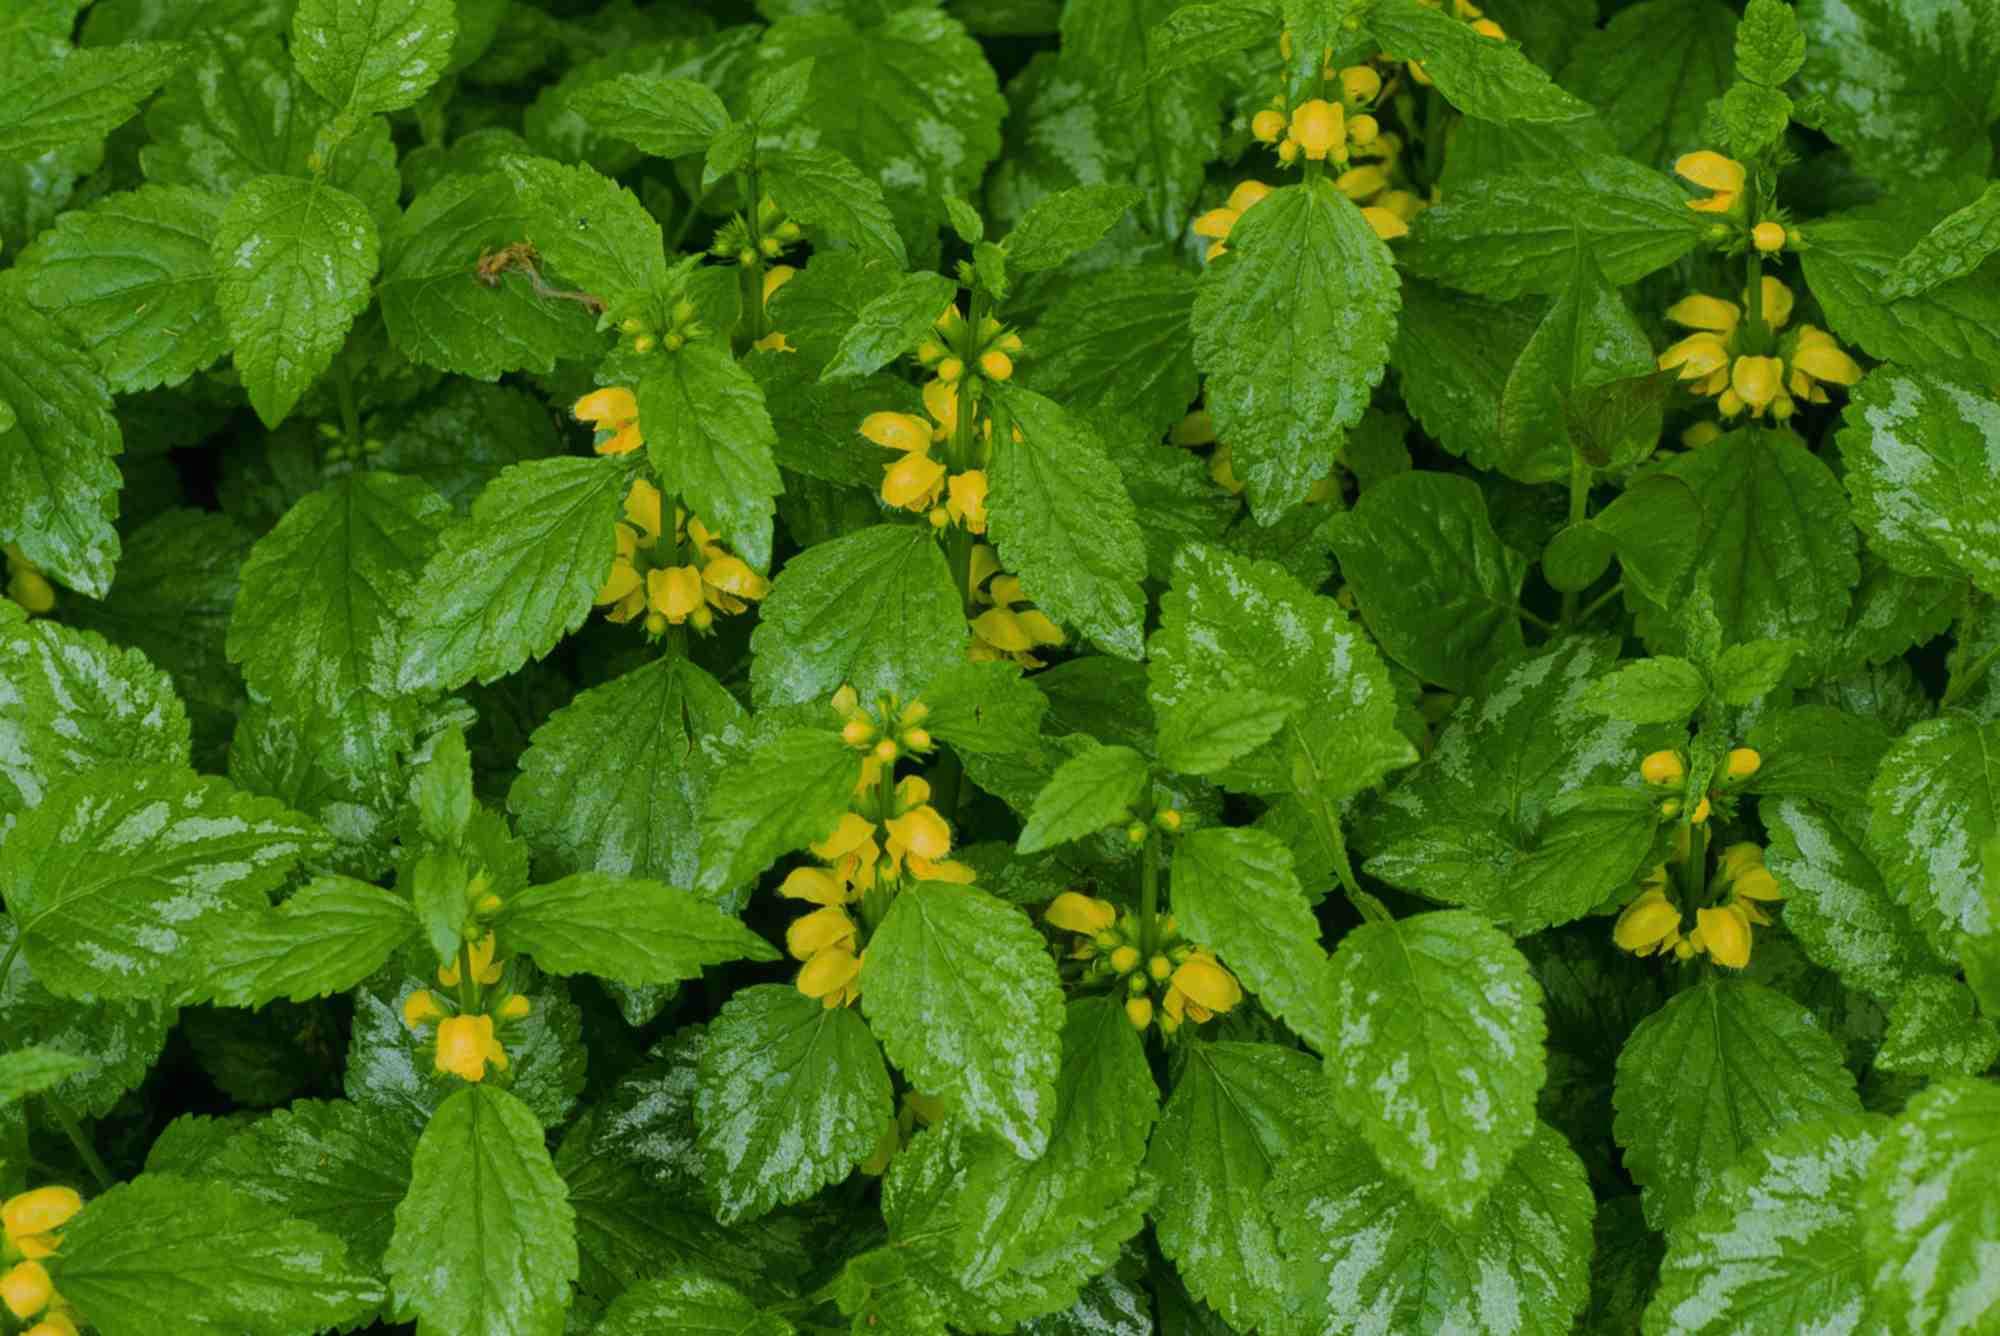 Lamiastrum galeobdolon var. variegata (Yellow archangel)